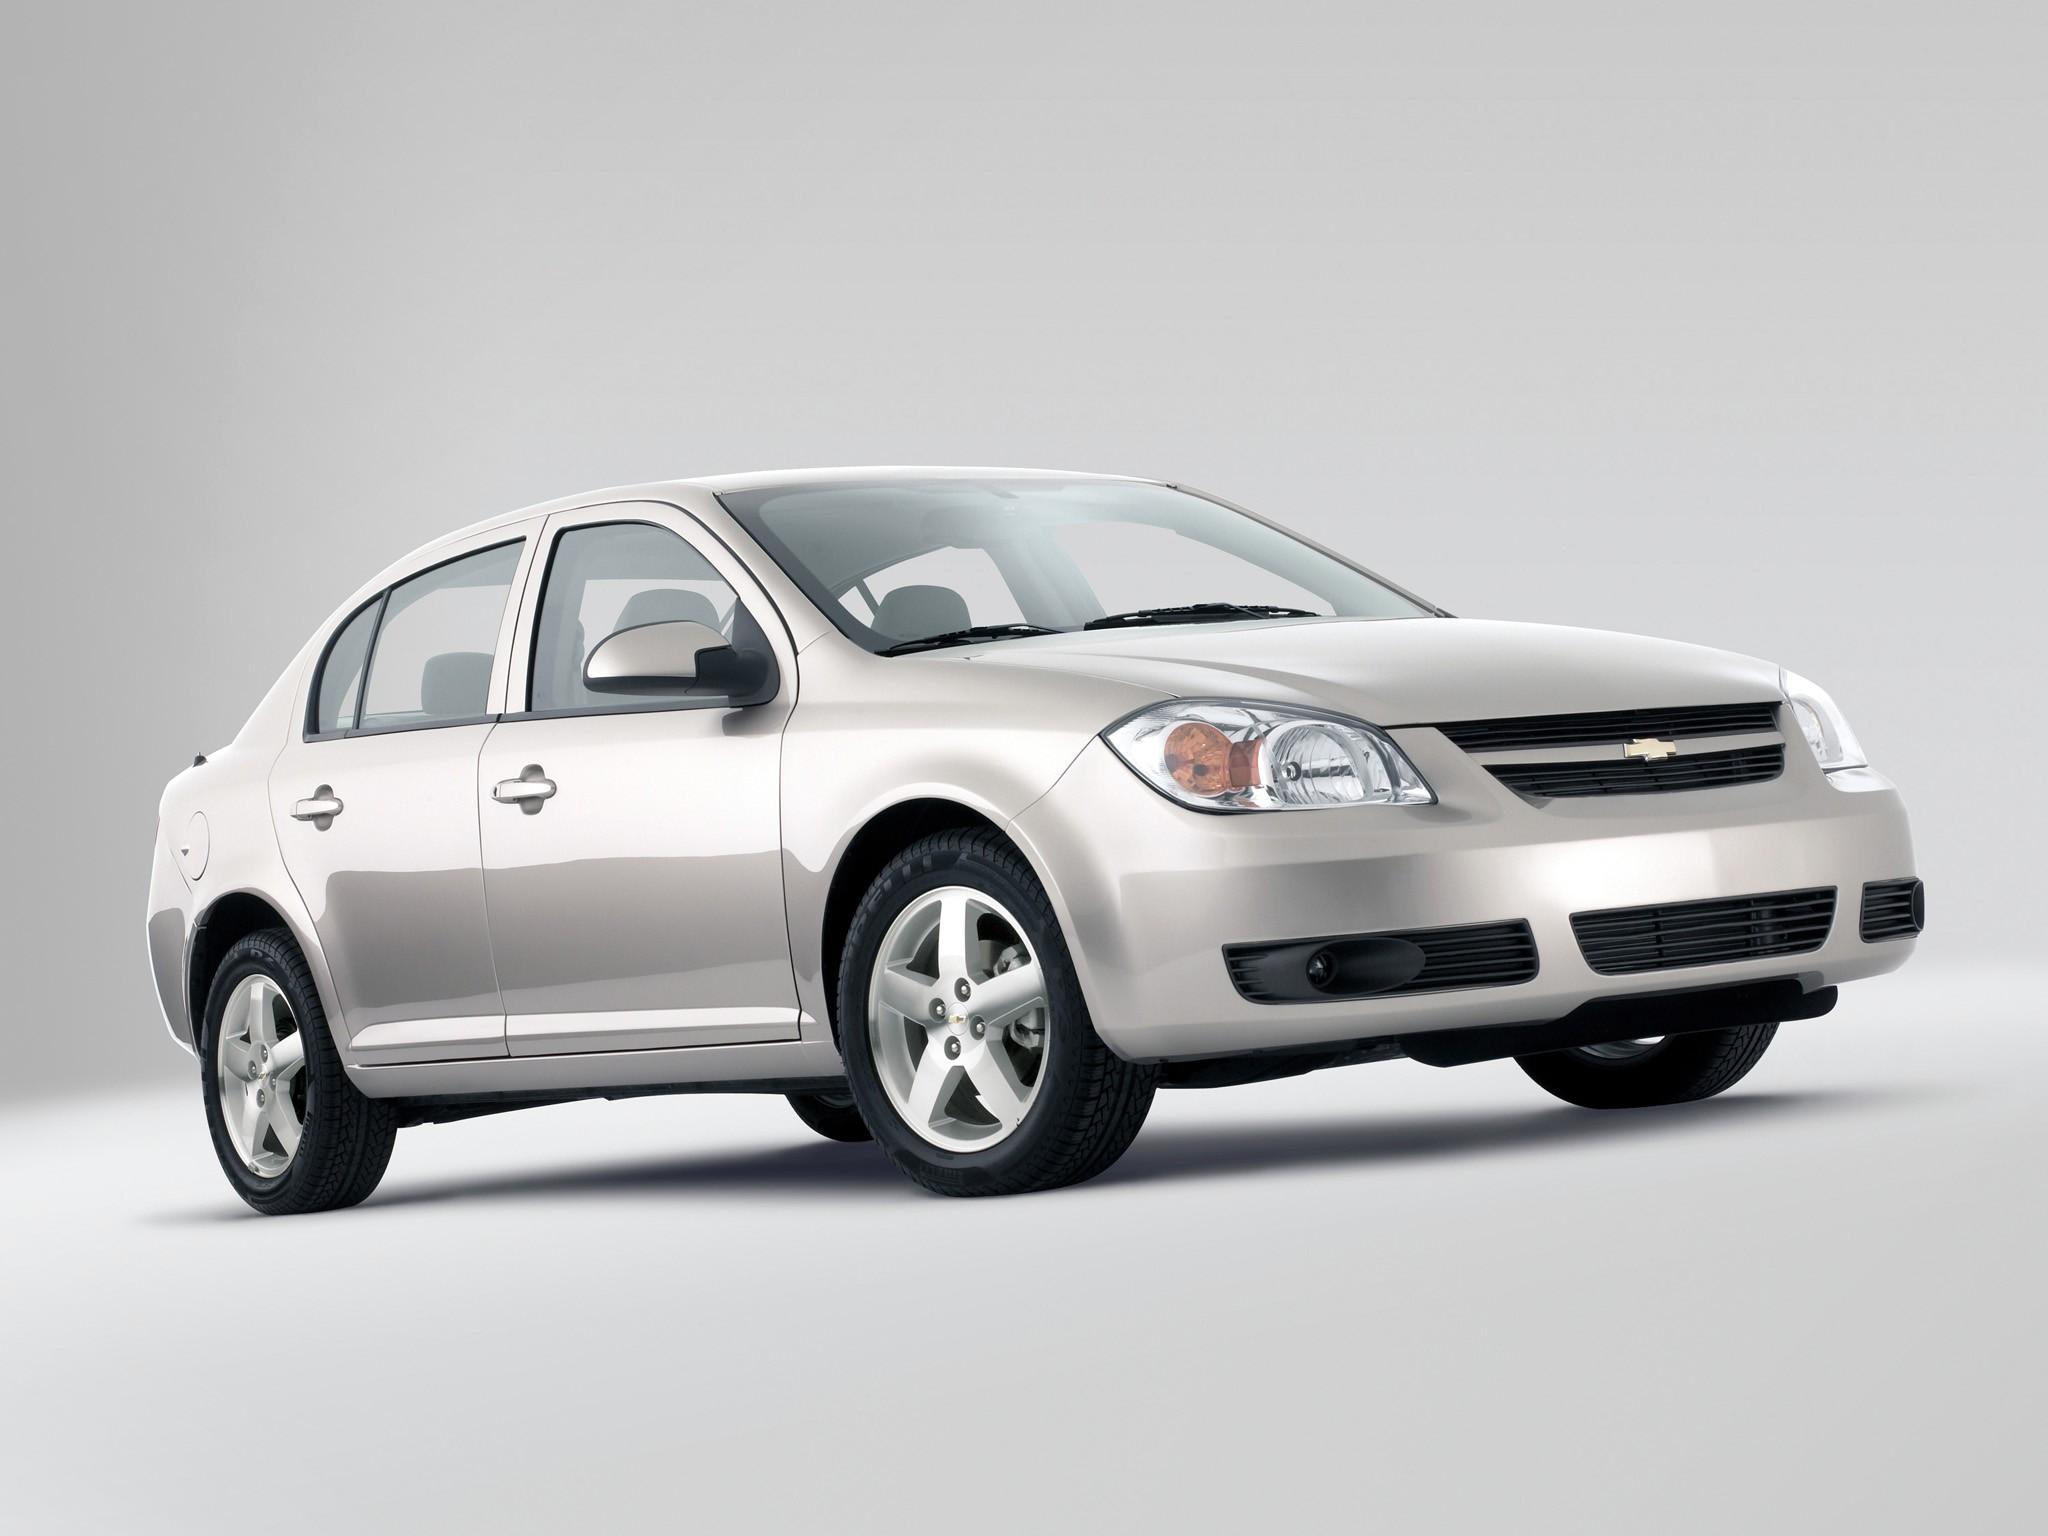 cobalt chevrolet sedan 2004 2008 2007 2005 cars autoevolution 2009 specs 2006